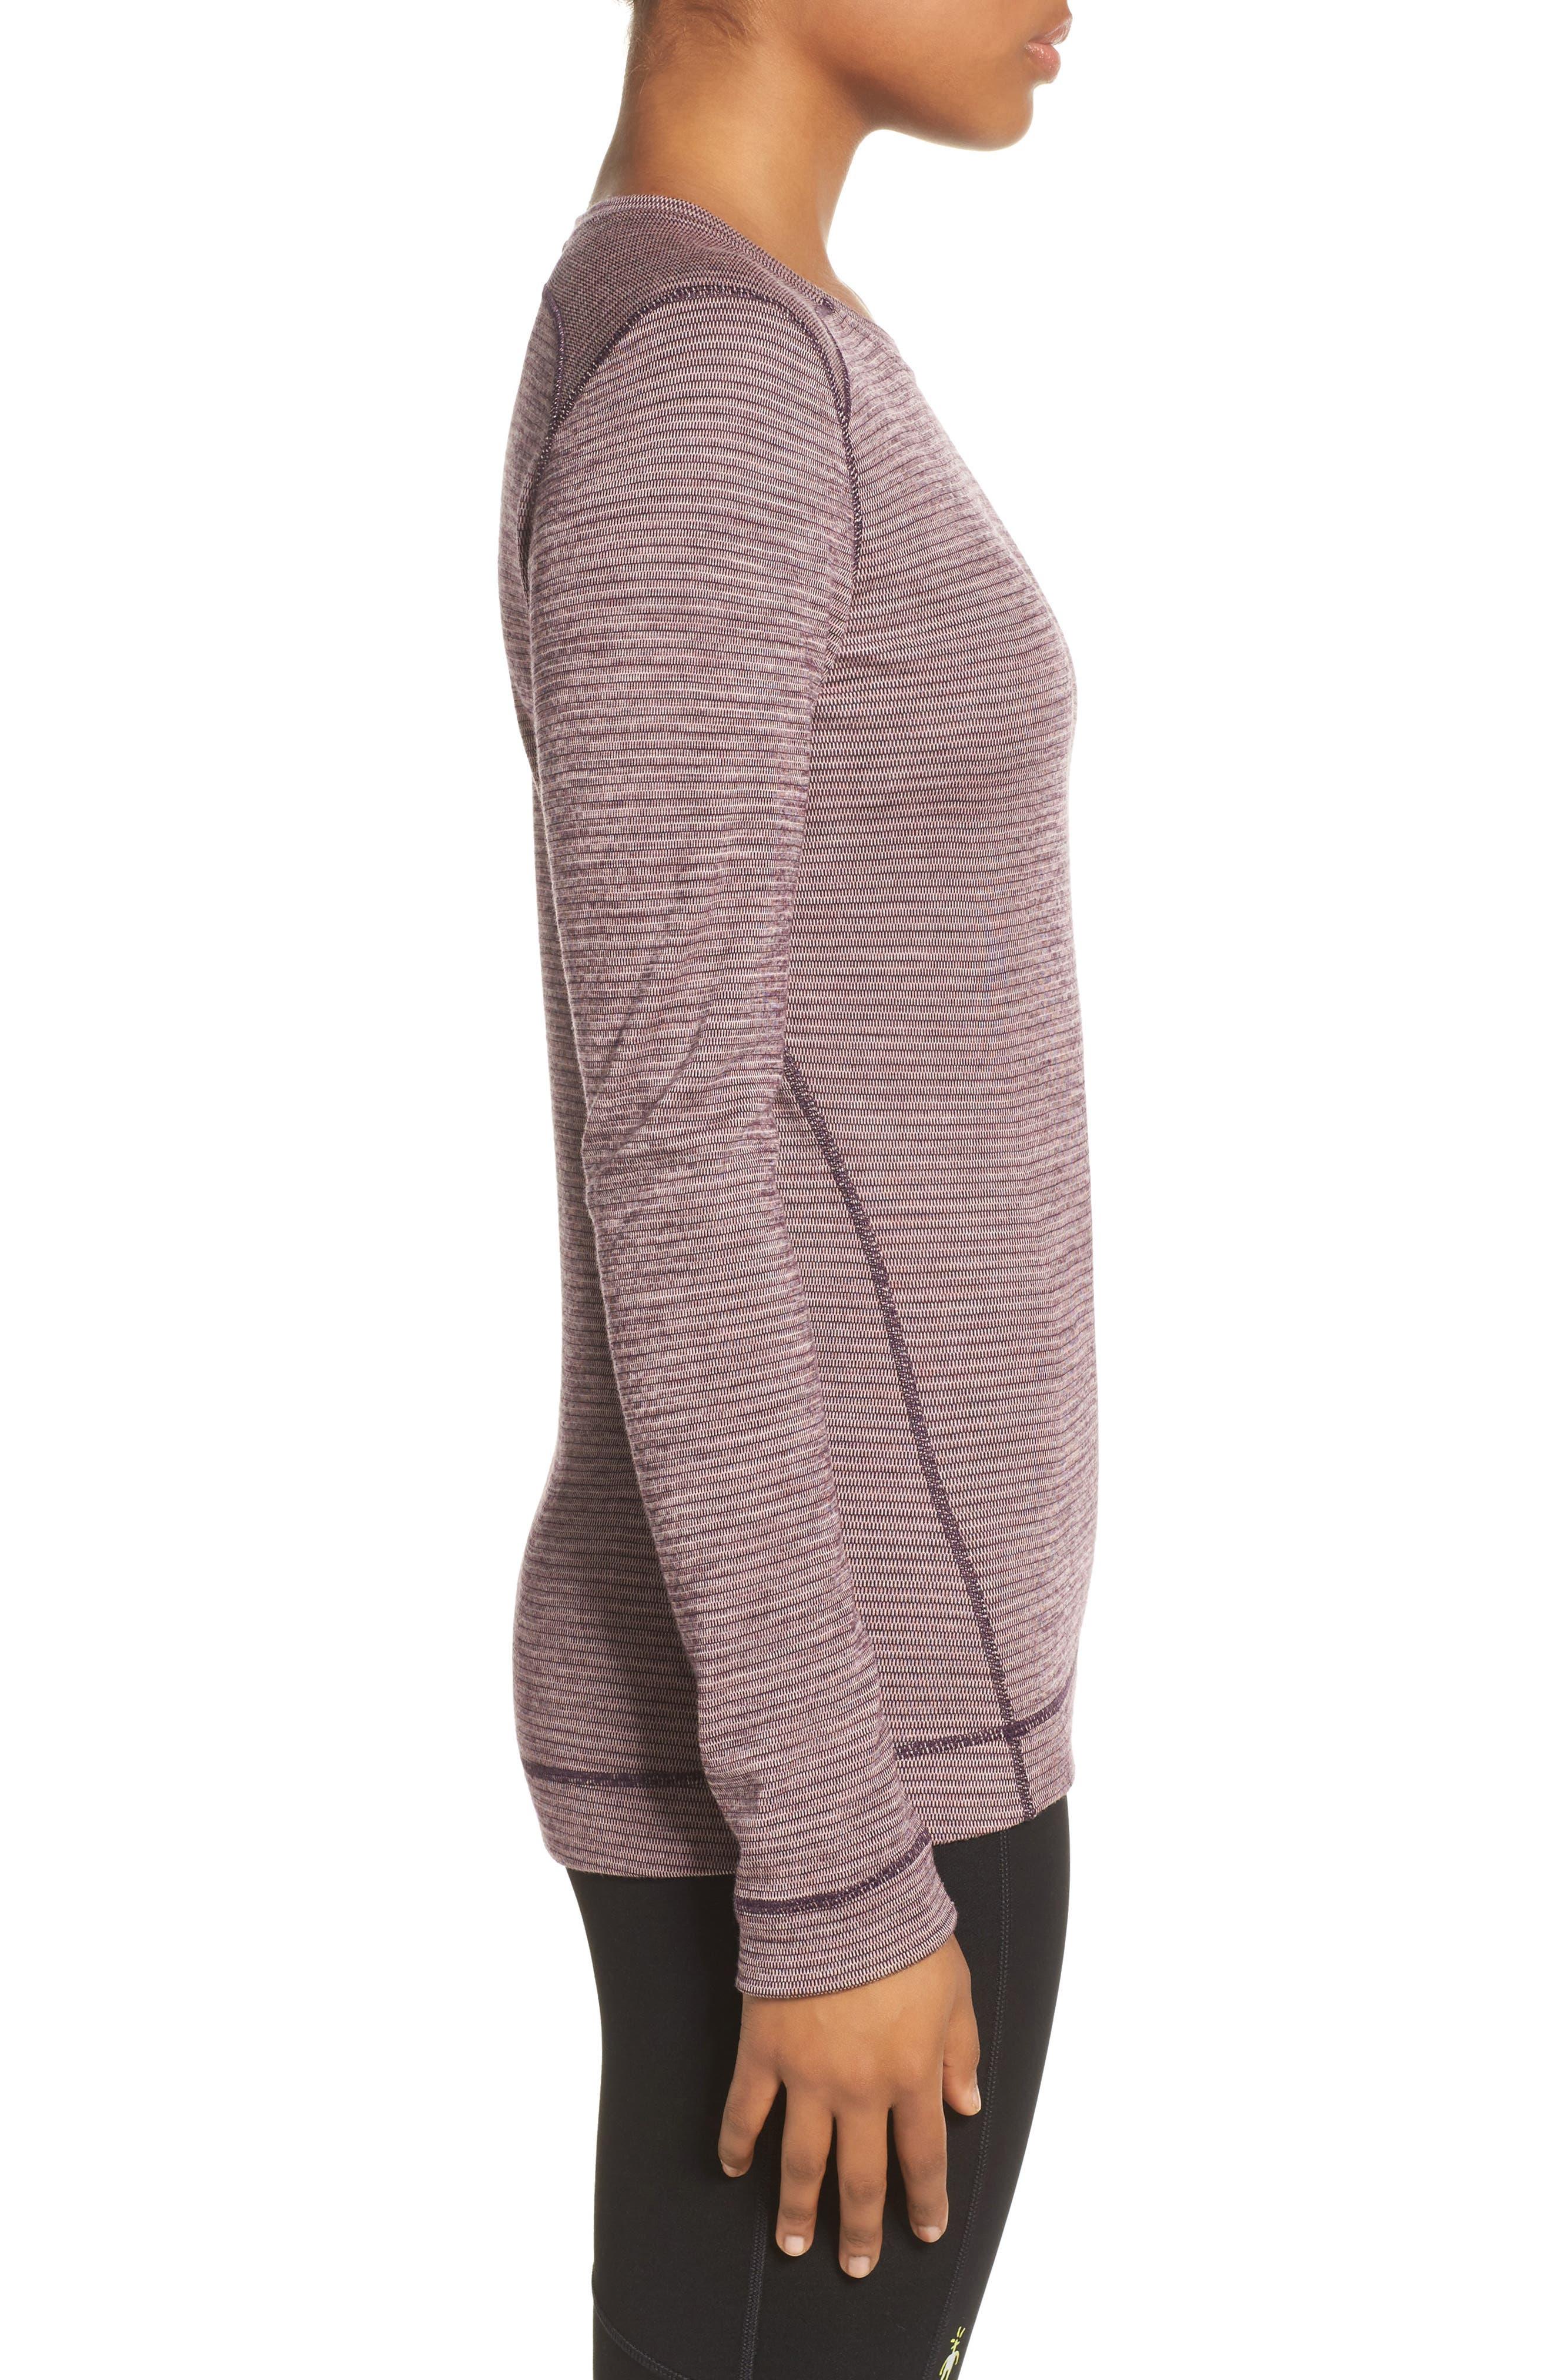 Merino Wool 250 Base Layer Top,                             Alternate thumbnail 3, color,                             Bordeaux